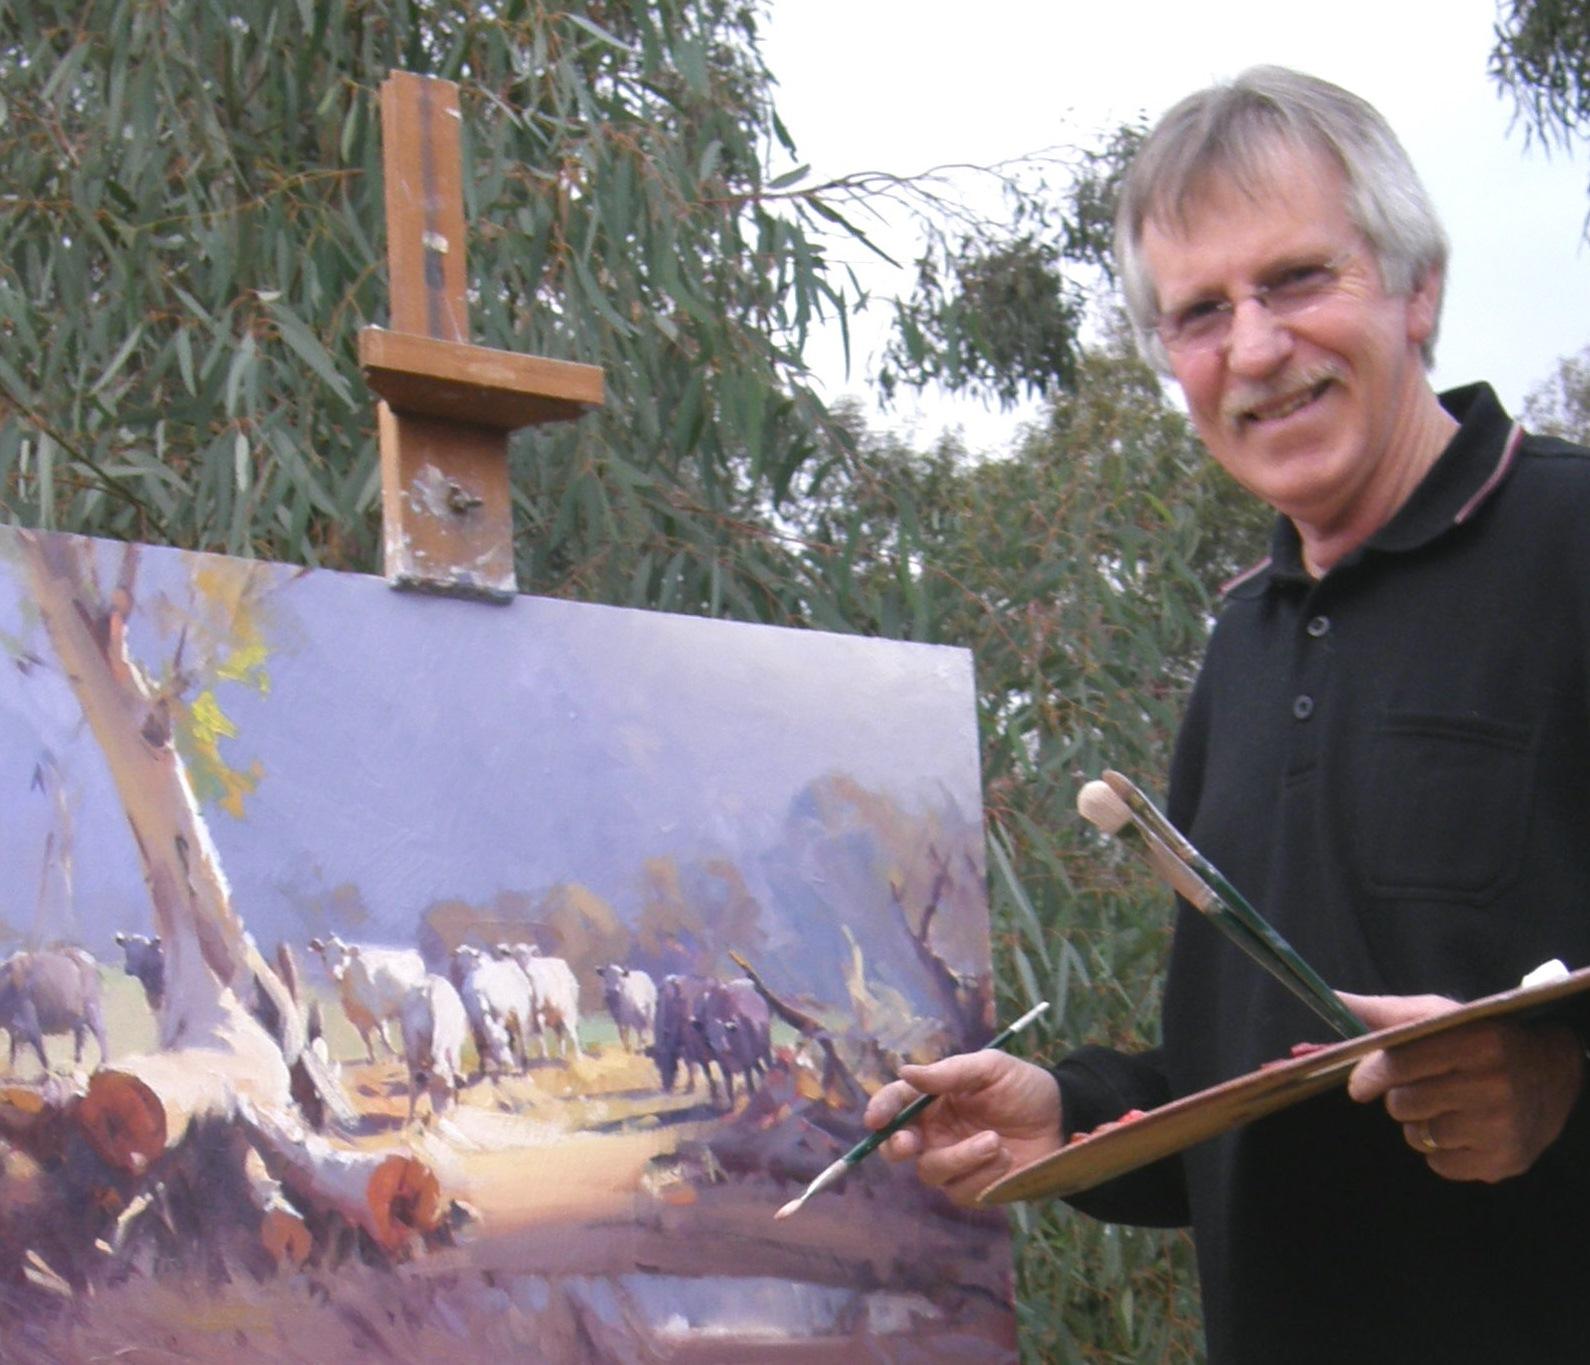 Ross Paterson, Ross Paterson artist, Ross paterson art tours, aussie redback tours, art tours australia, art tours pilbara, pilbara, pilbara wa